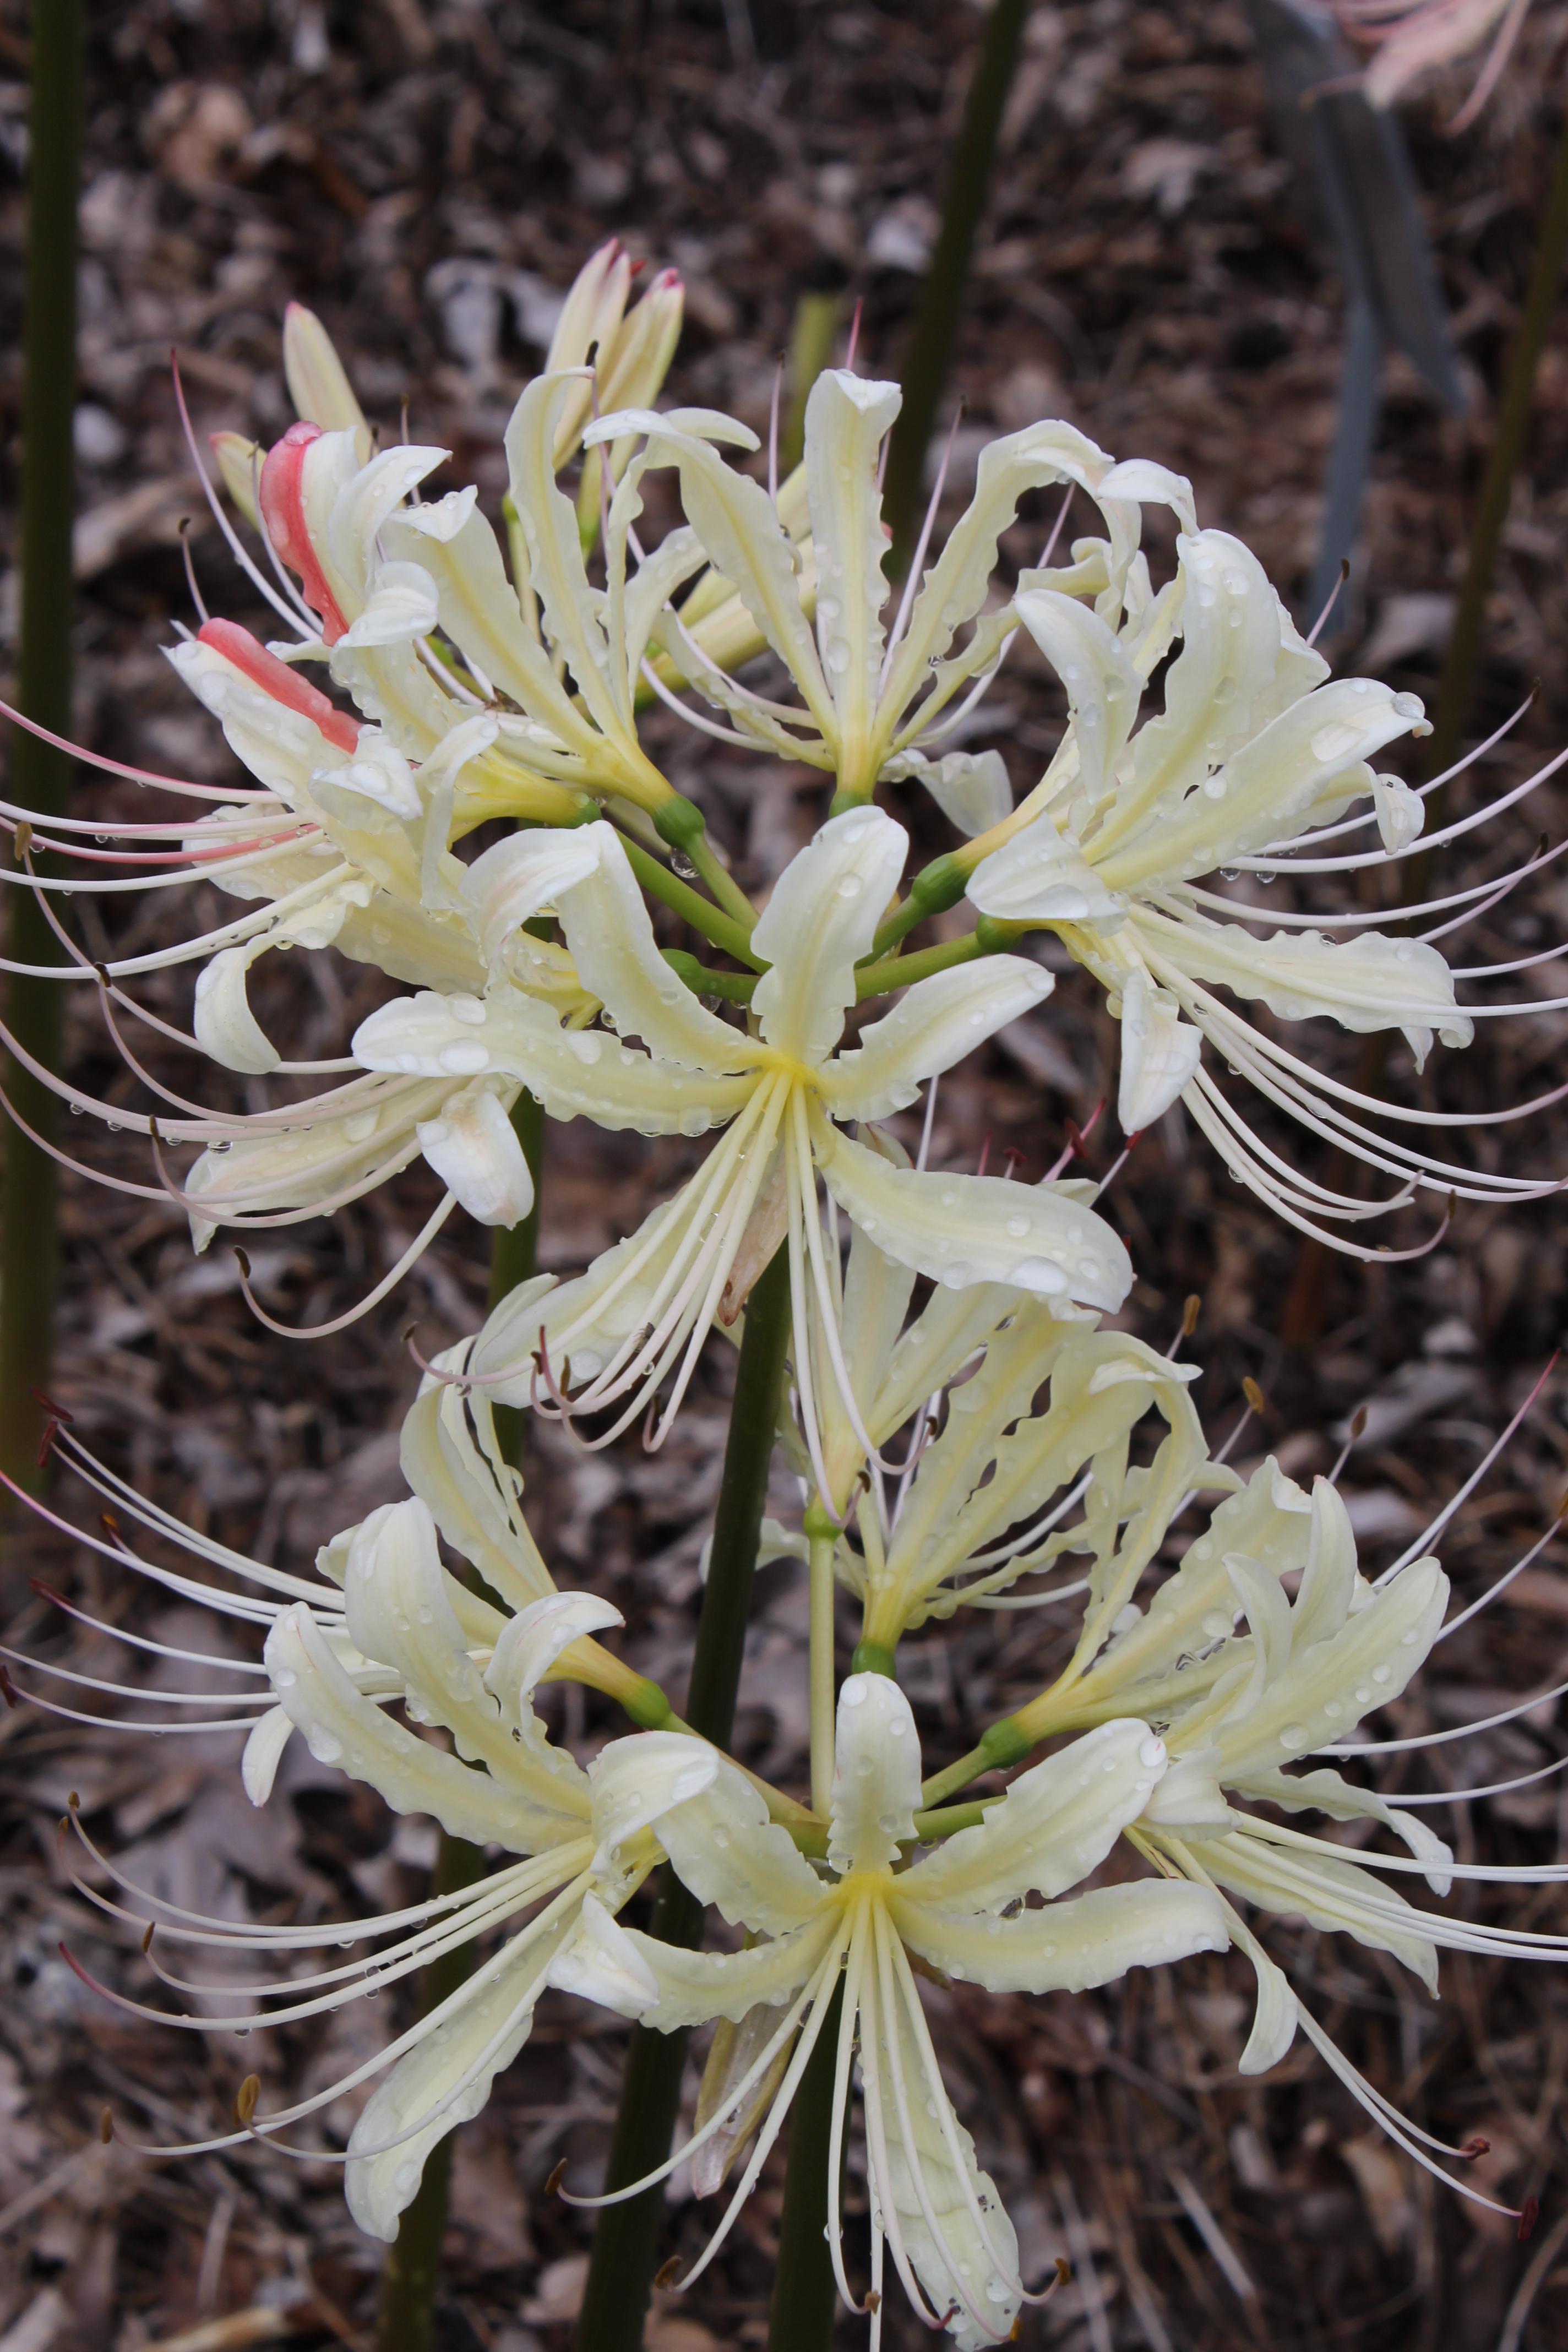 Lycoris x straminea 'Caldwell's Original' @ JLBG - Sam Caldwell's original clone of the hybrid of Lycoris radiata var. pumila x chinensis